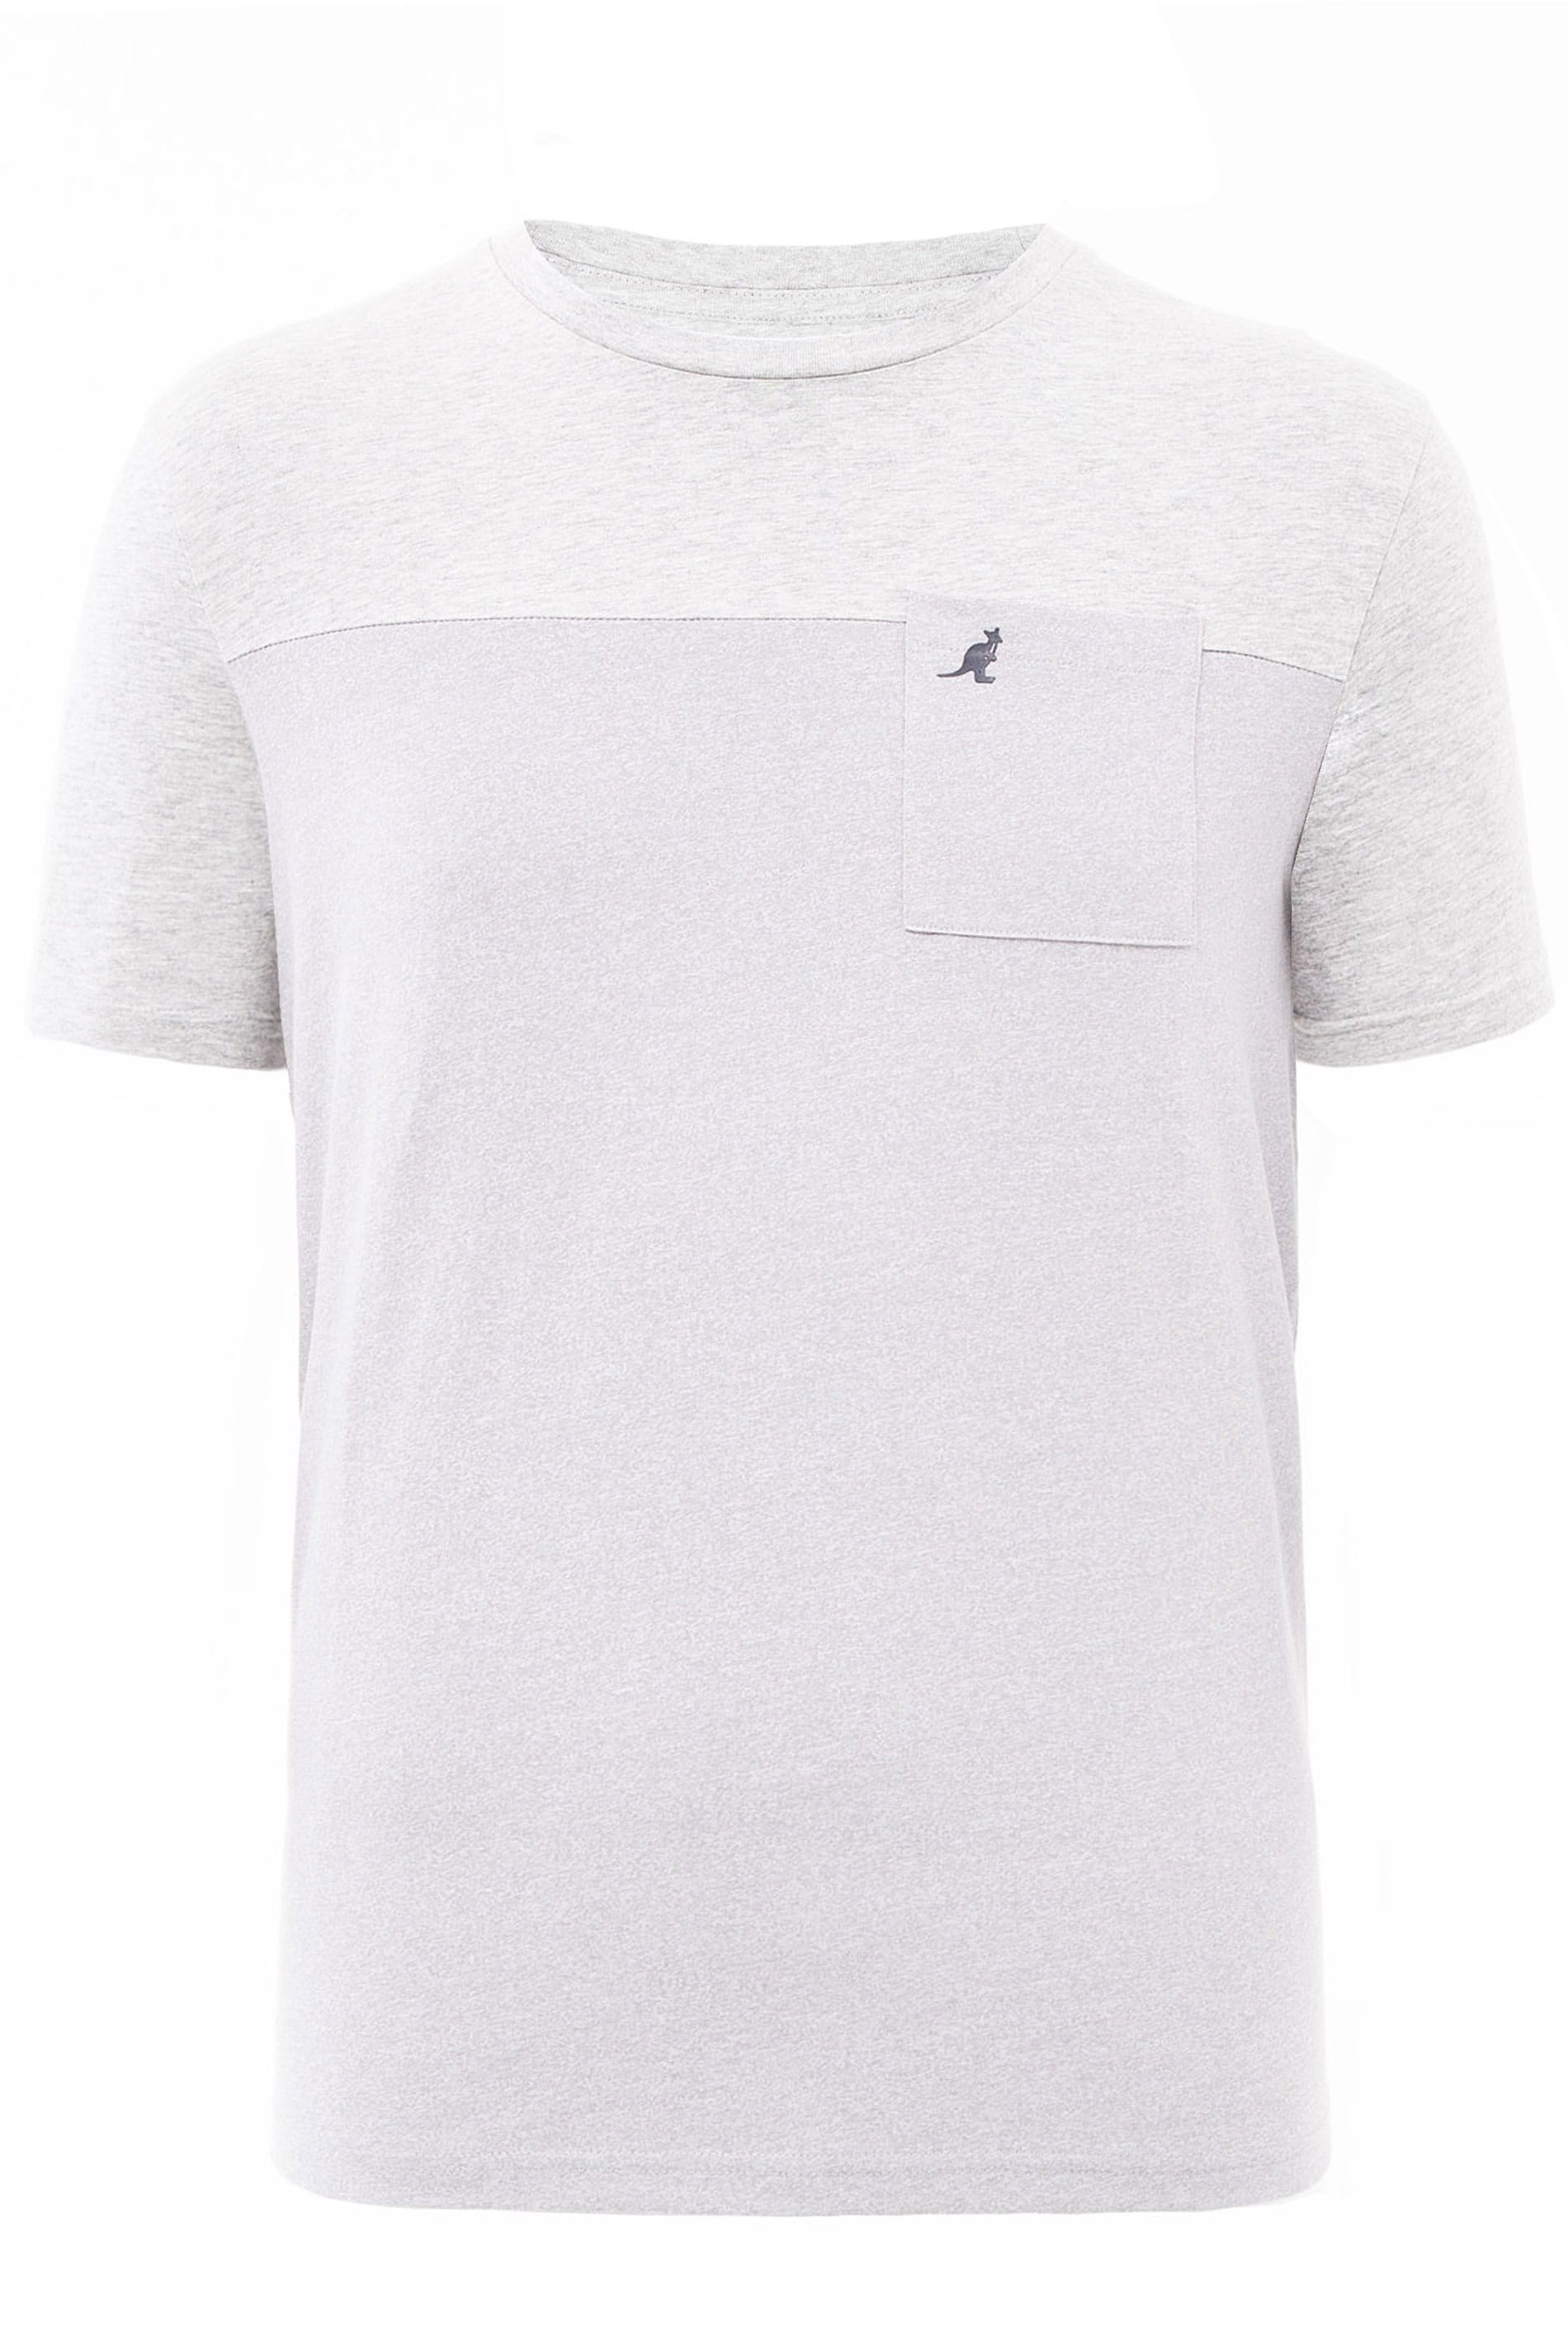 KANGOL Grey Marl Colour Block T-Shirt